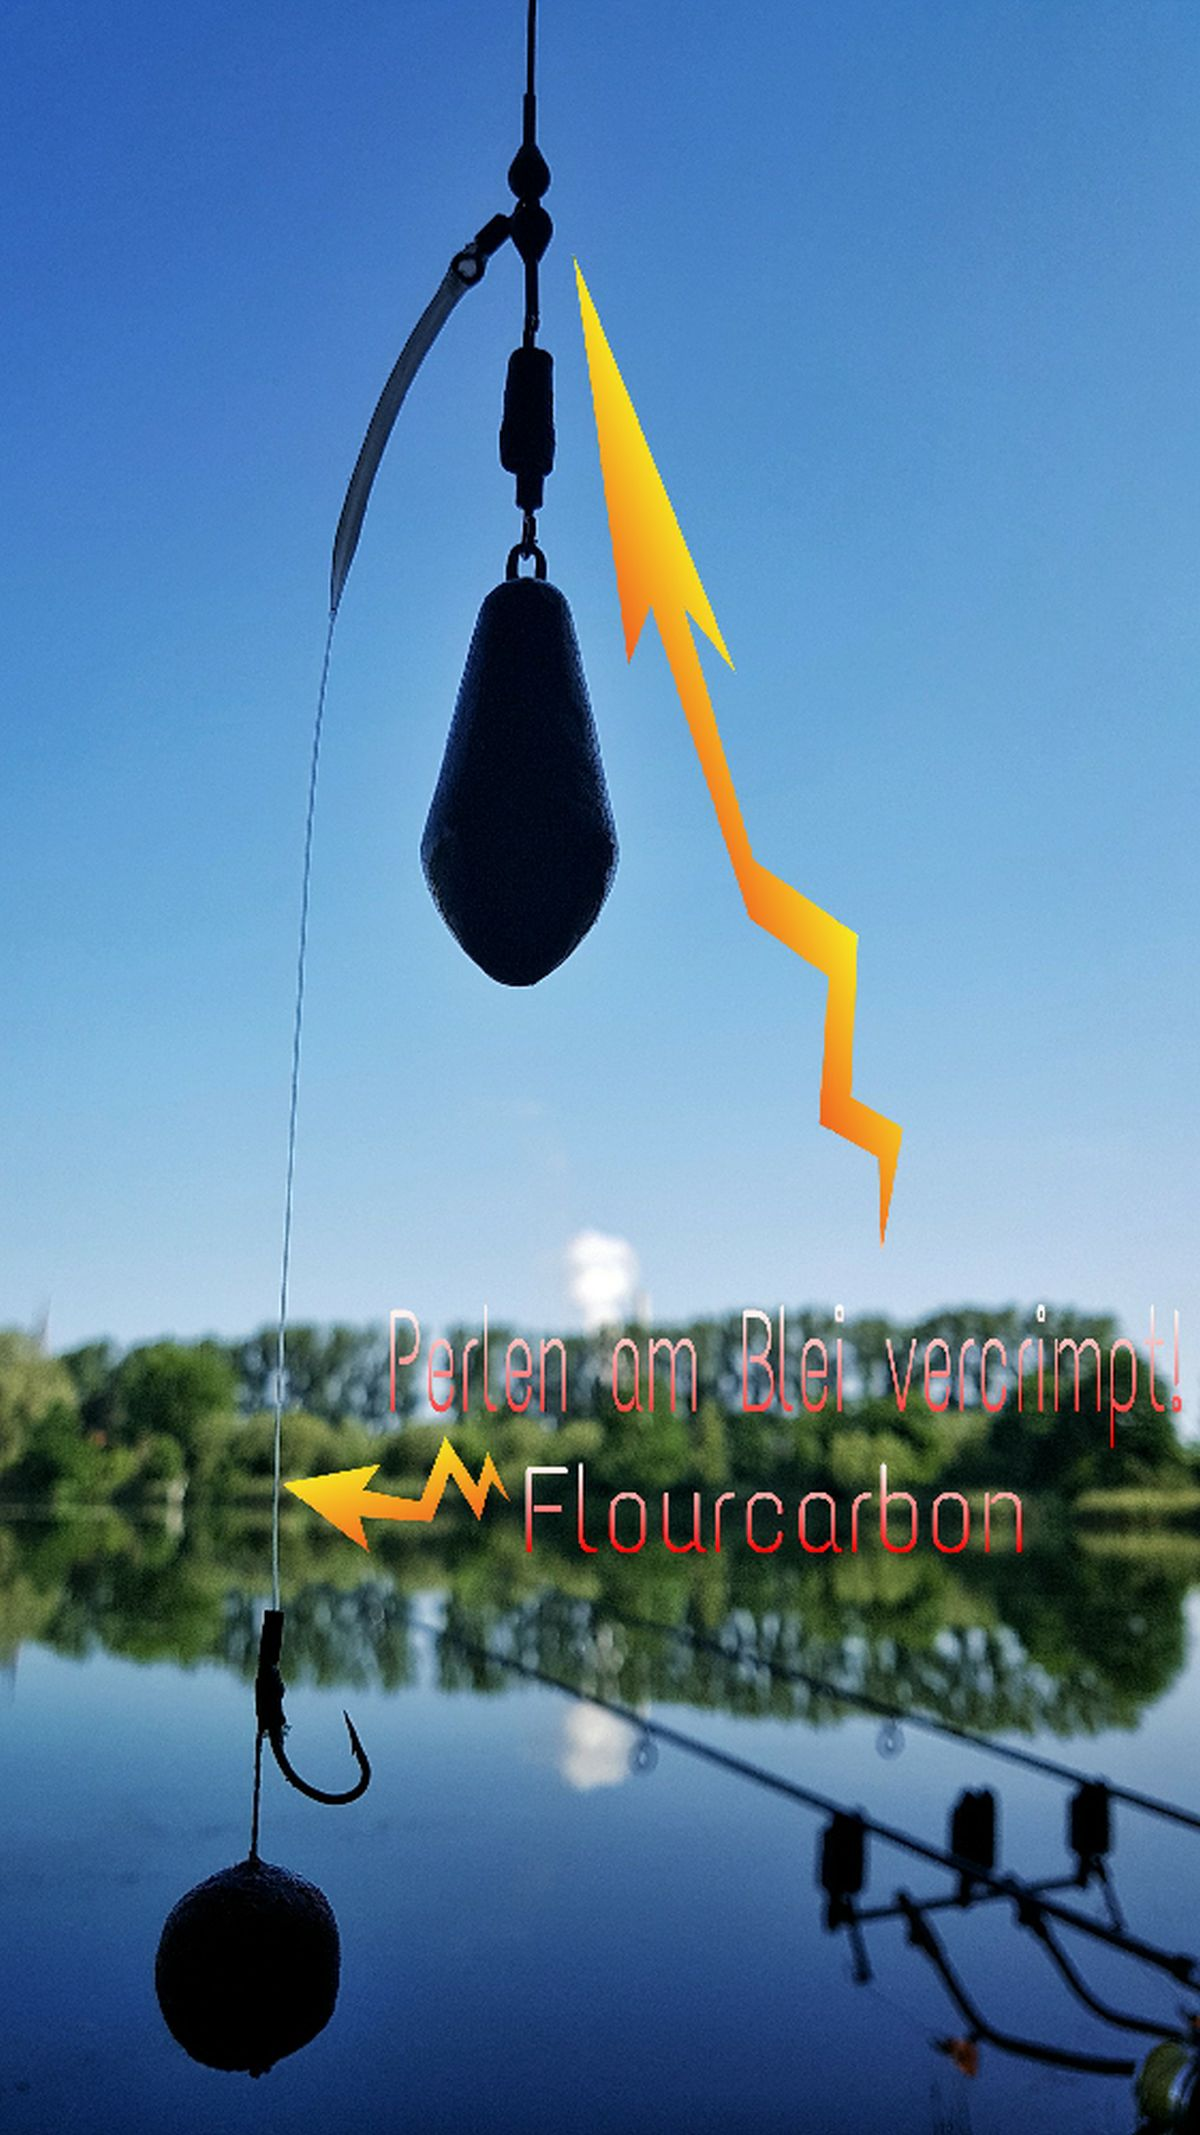 Helikopter-Rig-Flourcarbon